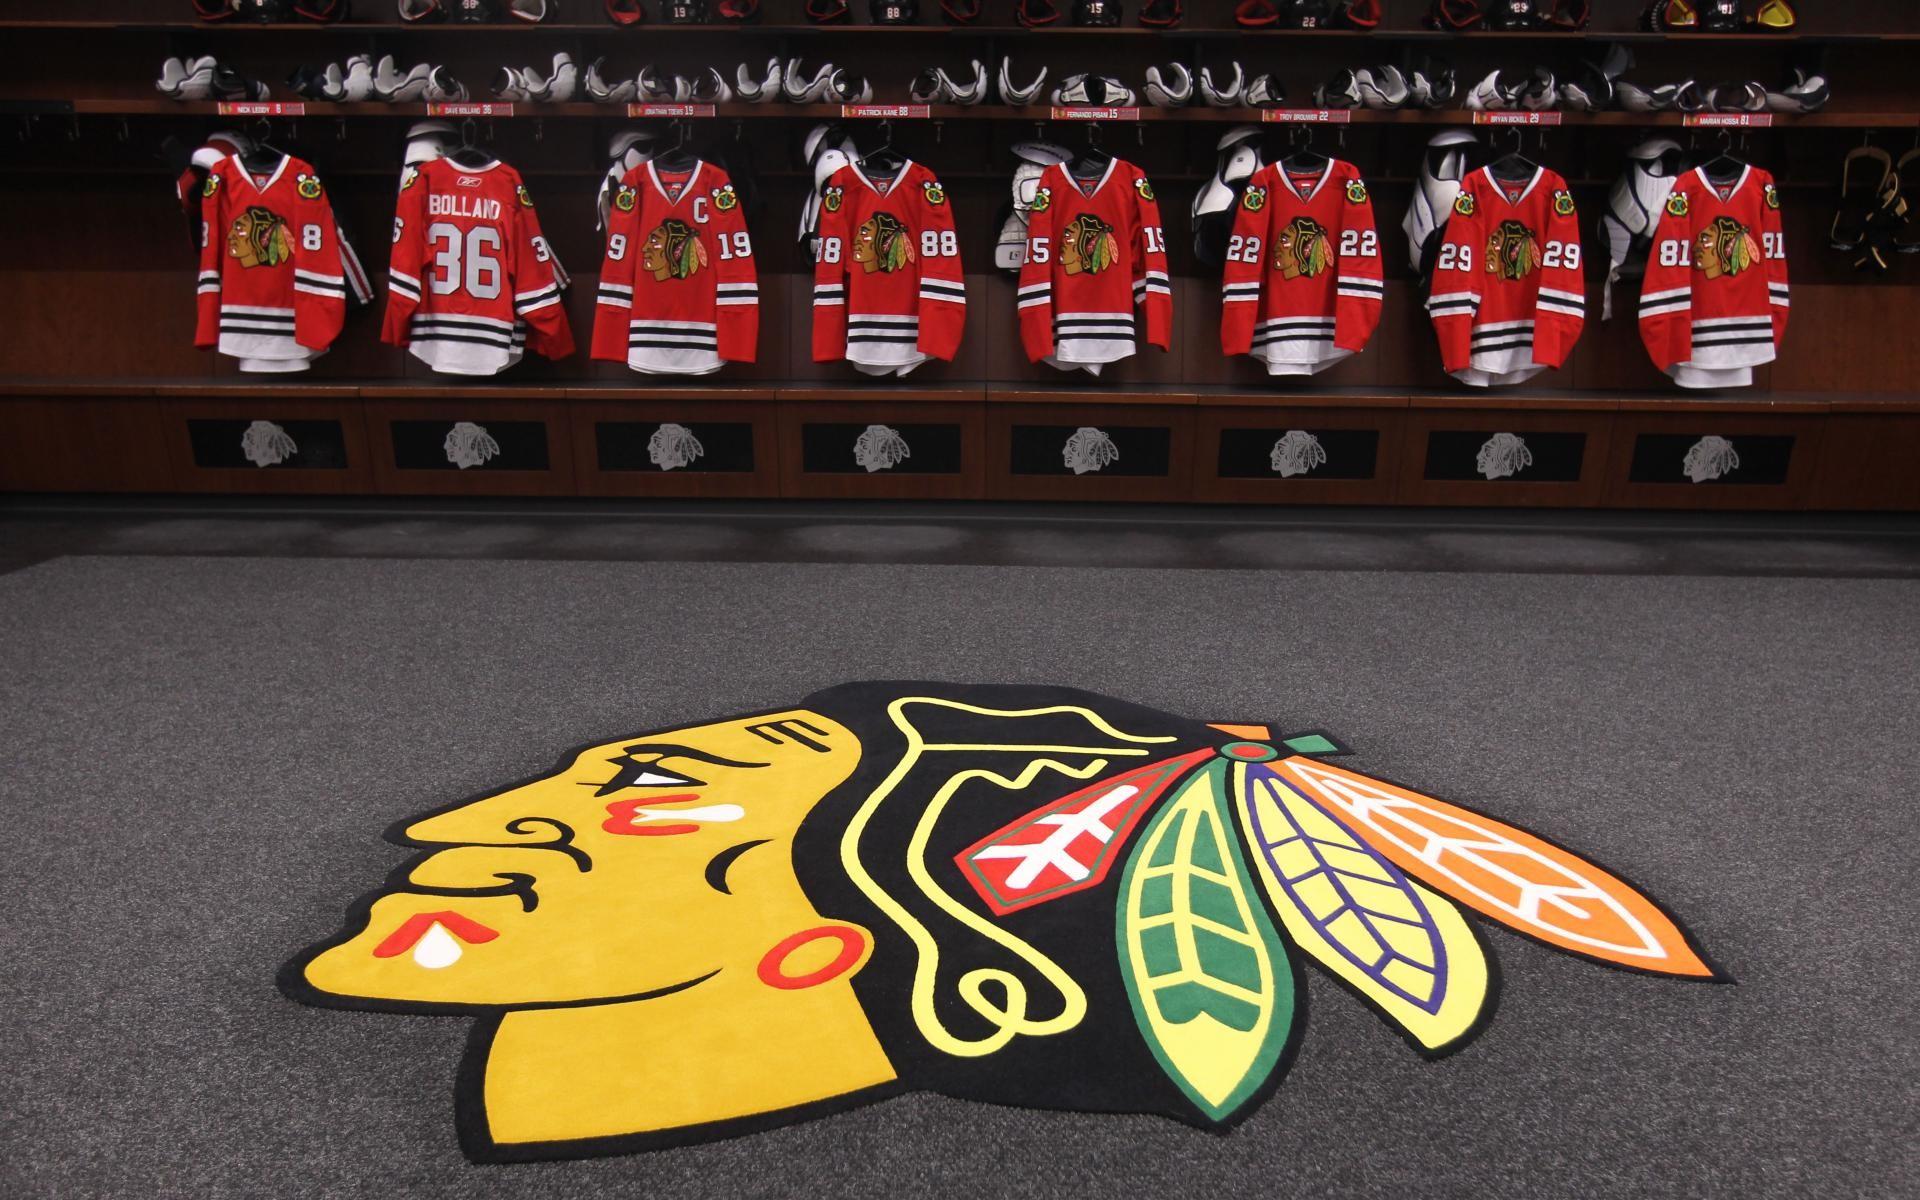 HQ Chicago Blackhawks Wallpaper.